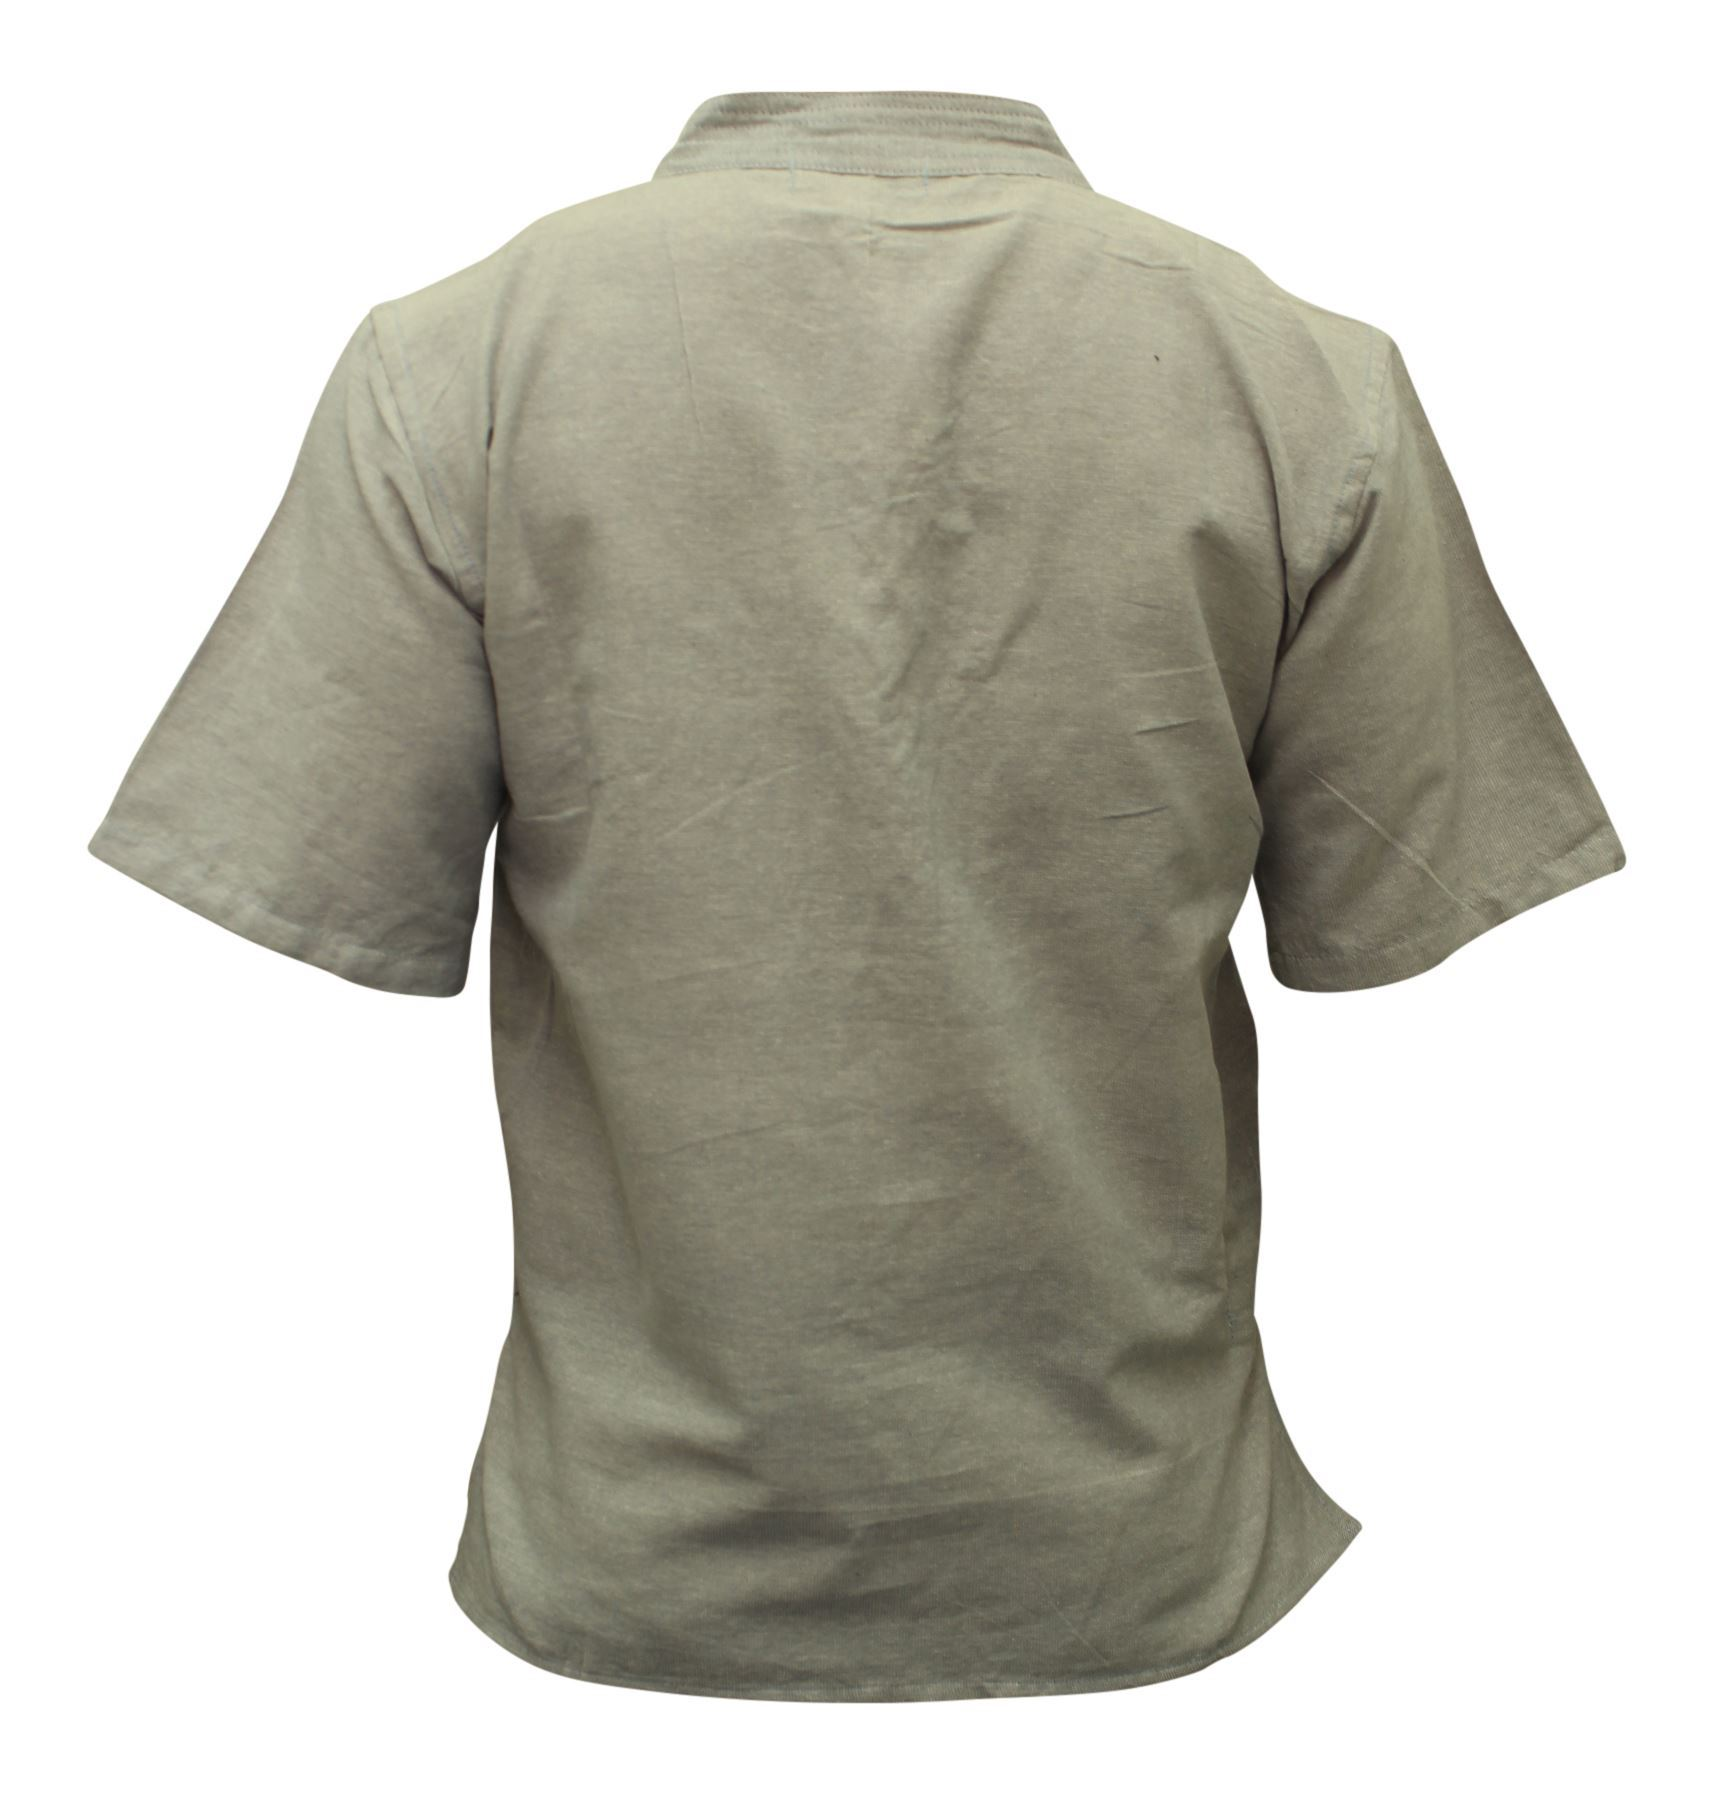 Mens-Hemp-Half-Sleeved-Hippy-Grandad-Shirts-Collarless-Ethnic-Festival-Boho-Tops thumbnail 8